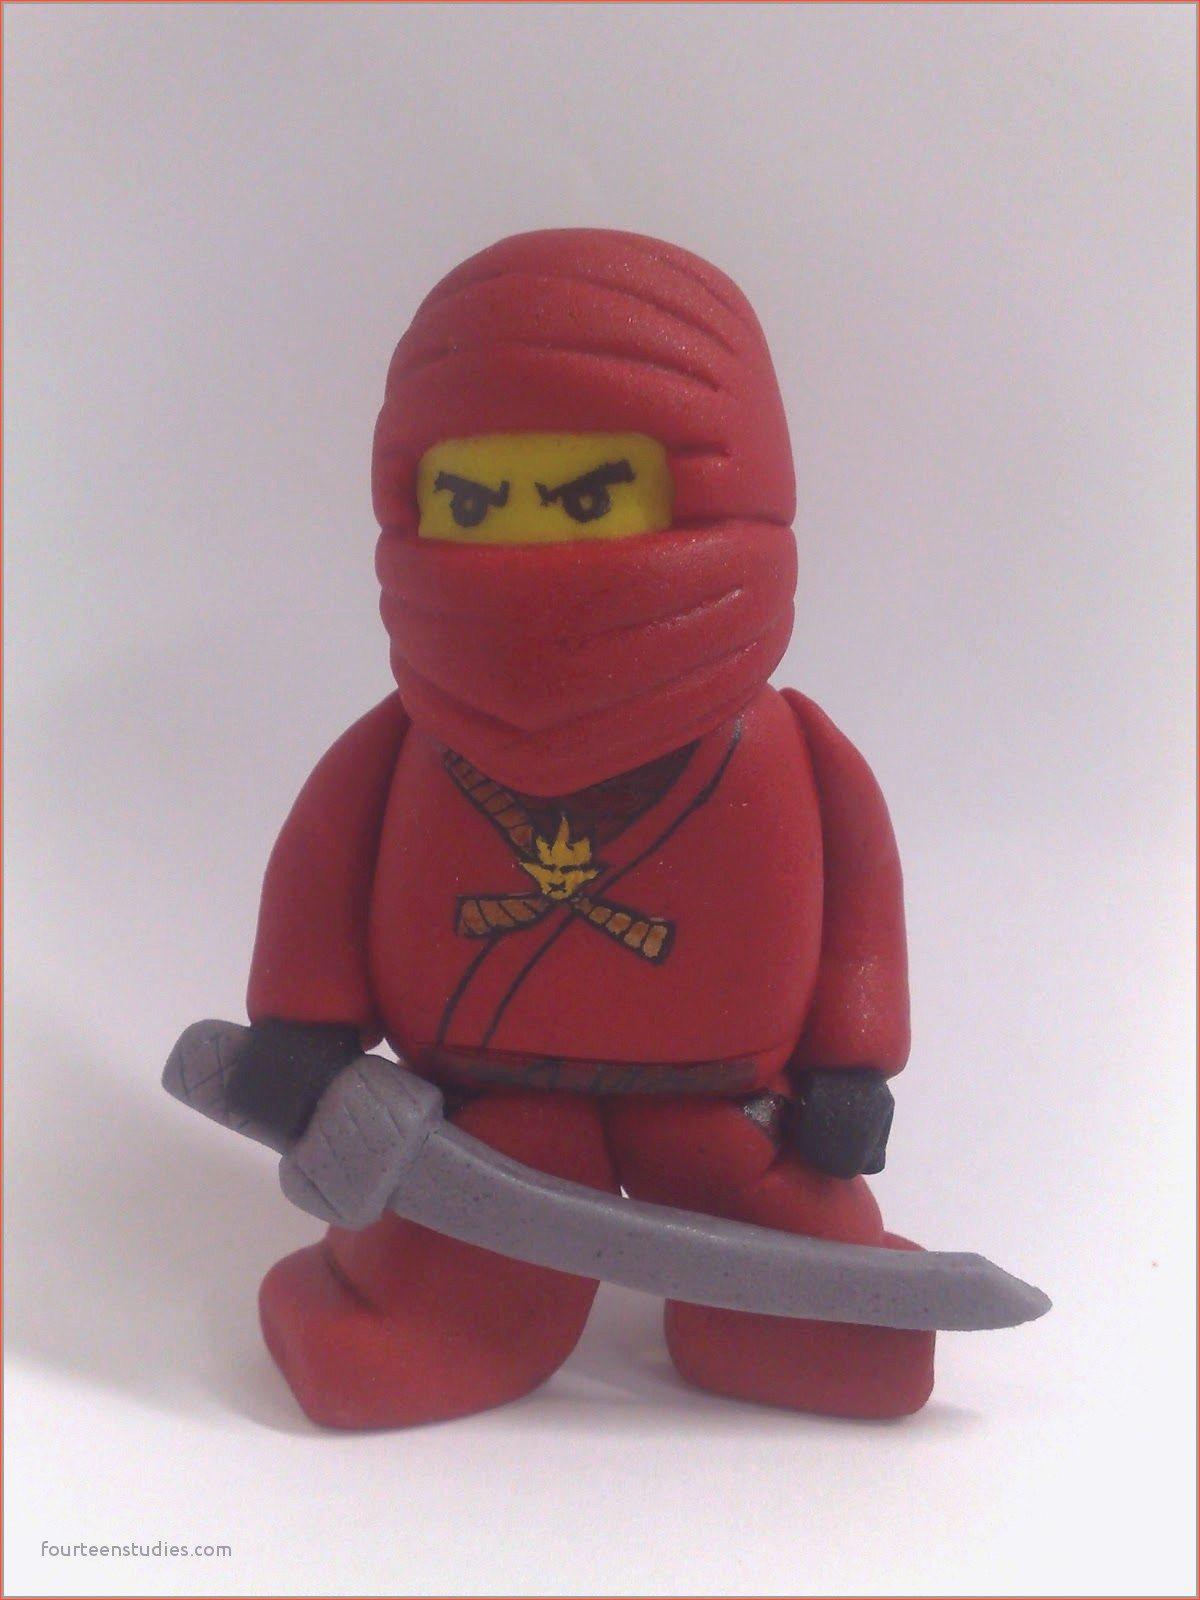 Ninjago Ausmalbilder Lego Inspirierend Ausmalbilder Ninjago Anacondrai Fotos